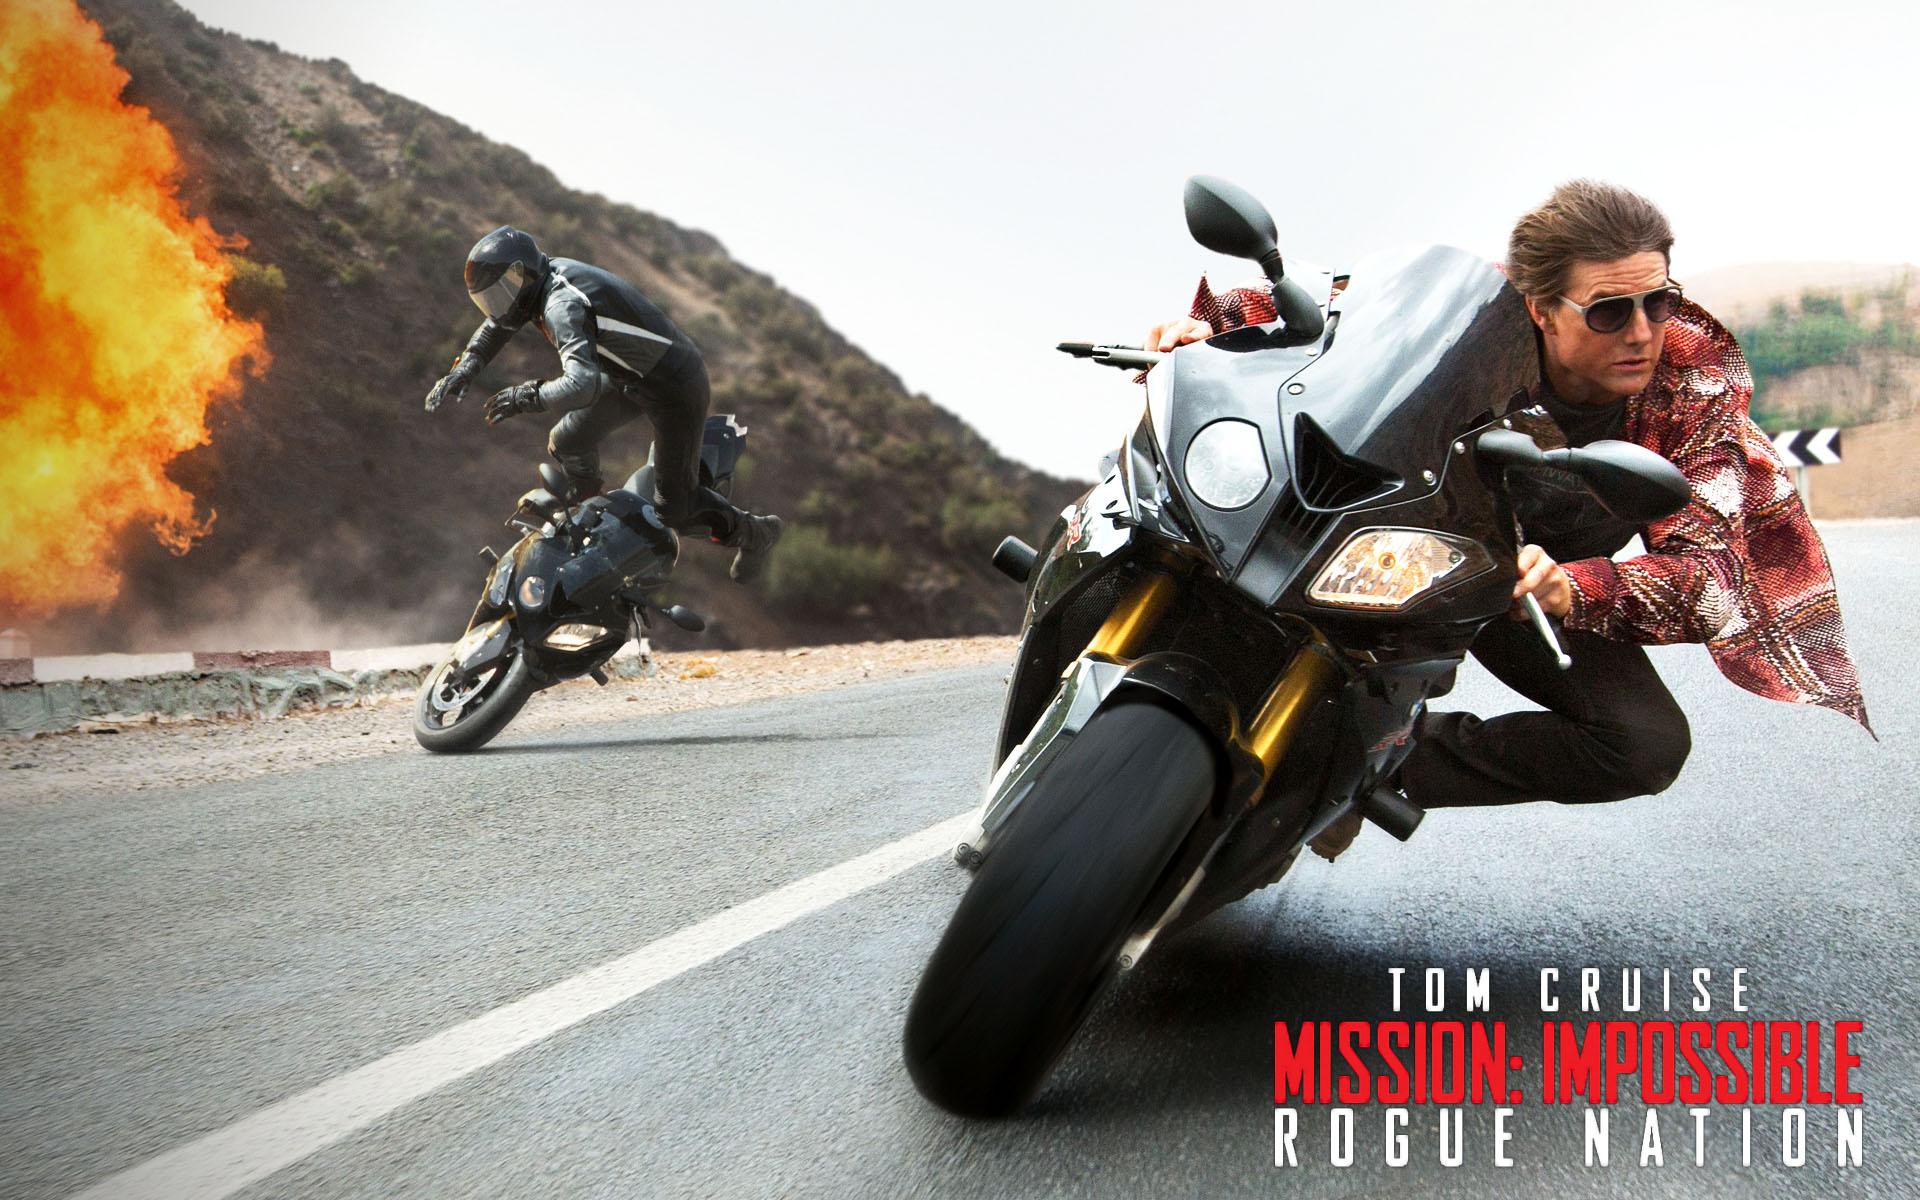 Mission Impossible Rogue Nation Tom Cruise LGR Eyewear Sunglasses